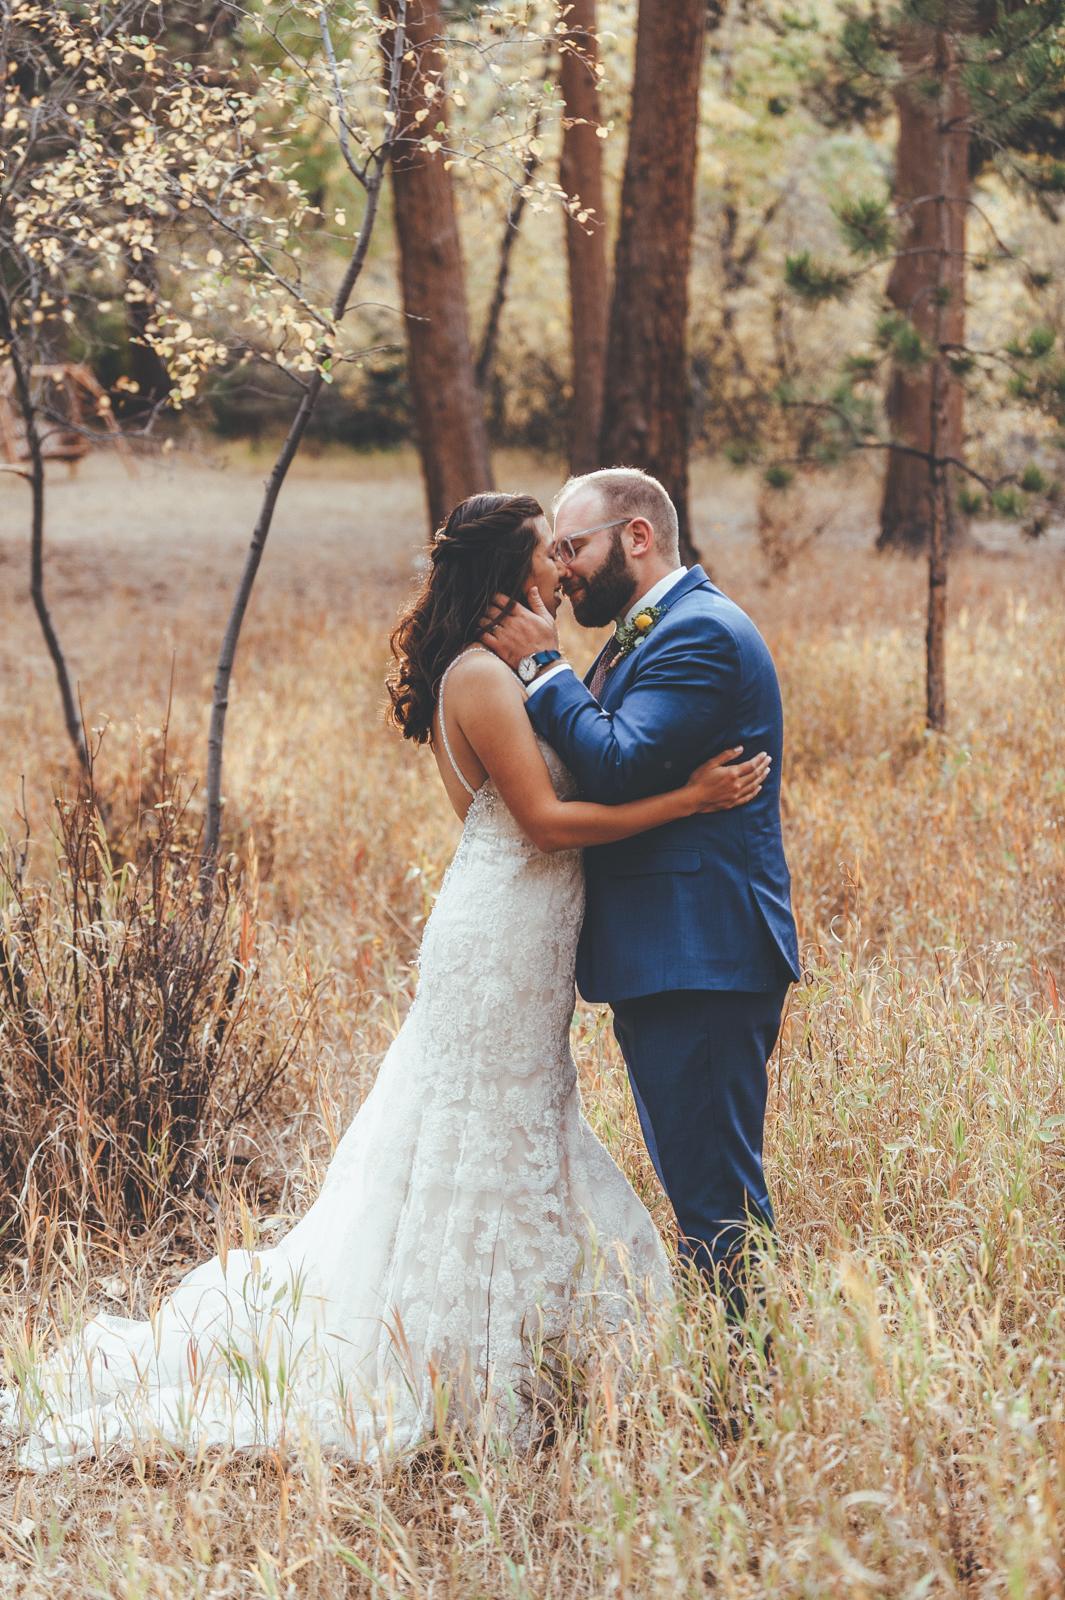 ChadFahnestockPhotography-estes-park-wedding-photography-038.jpg